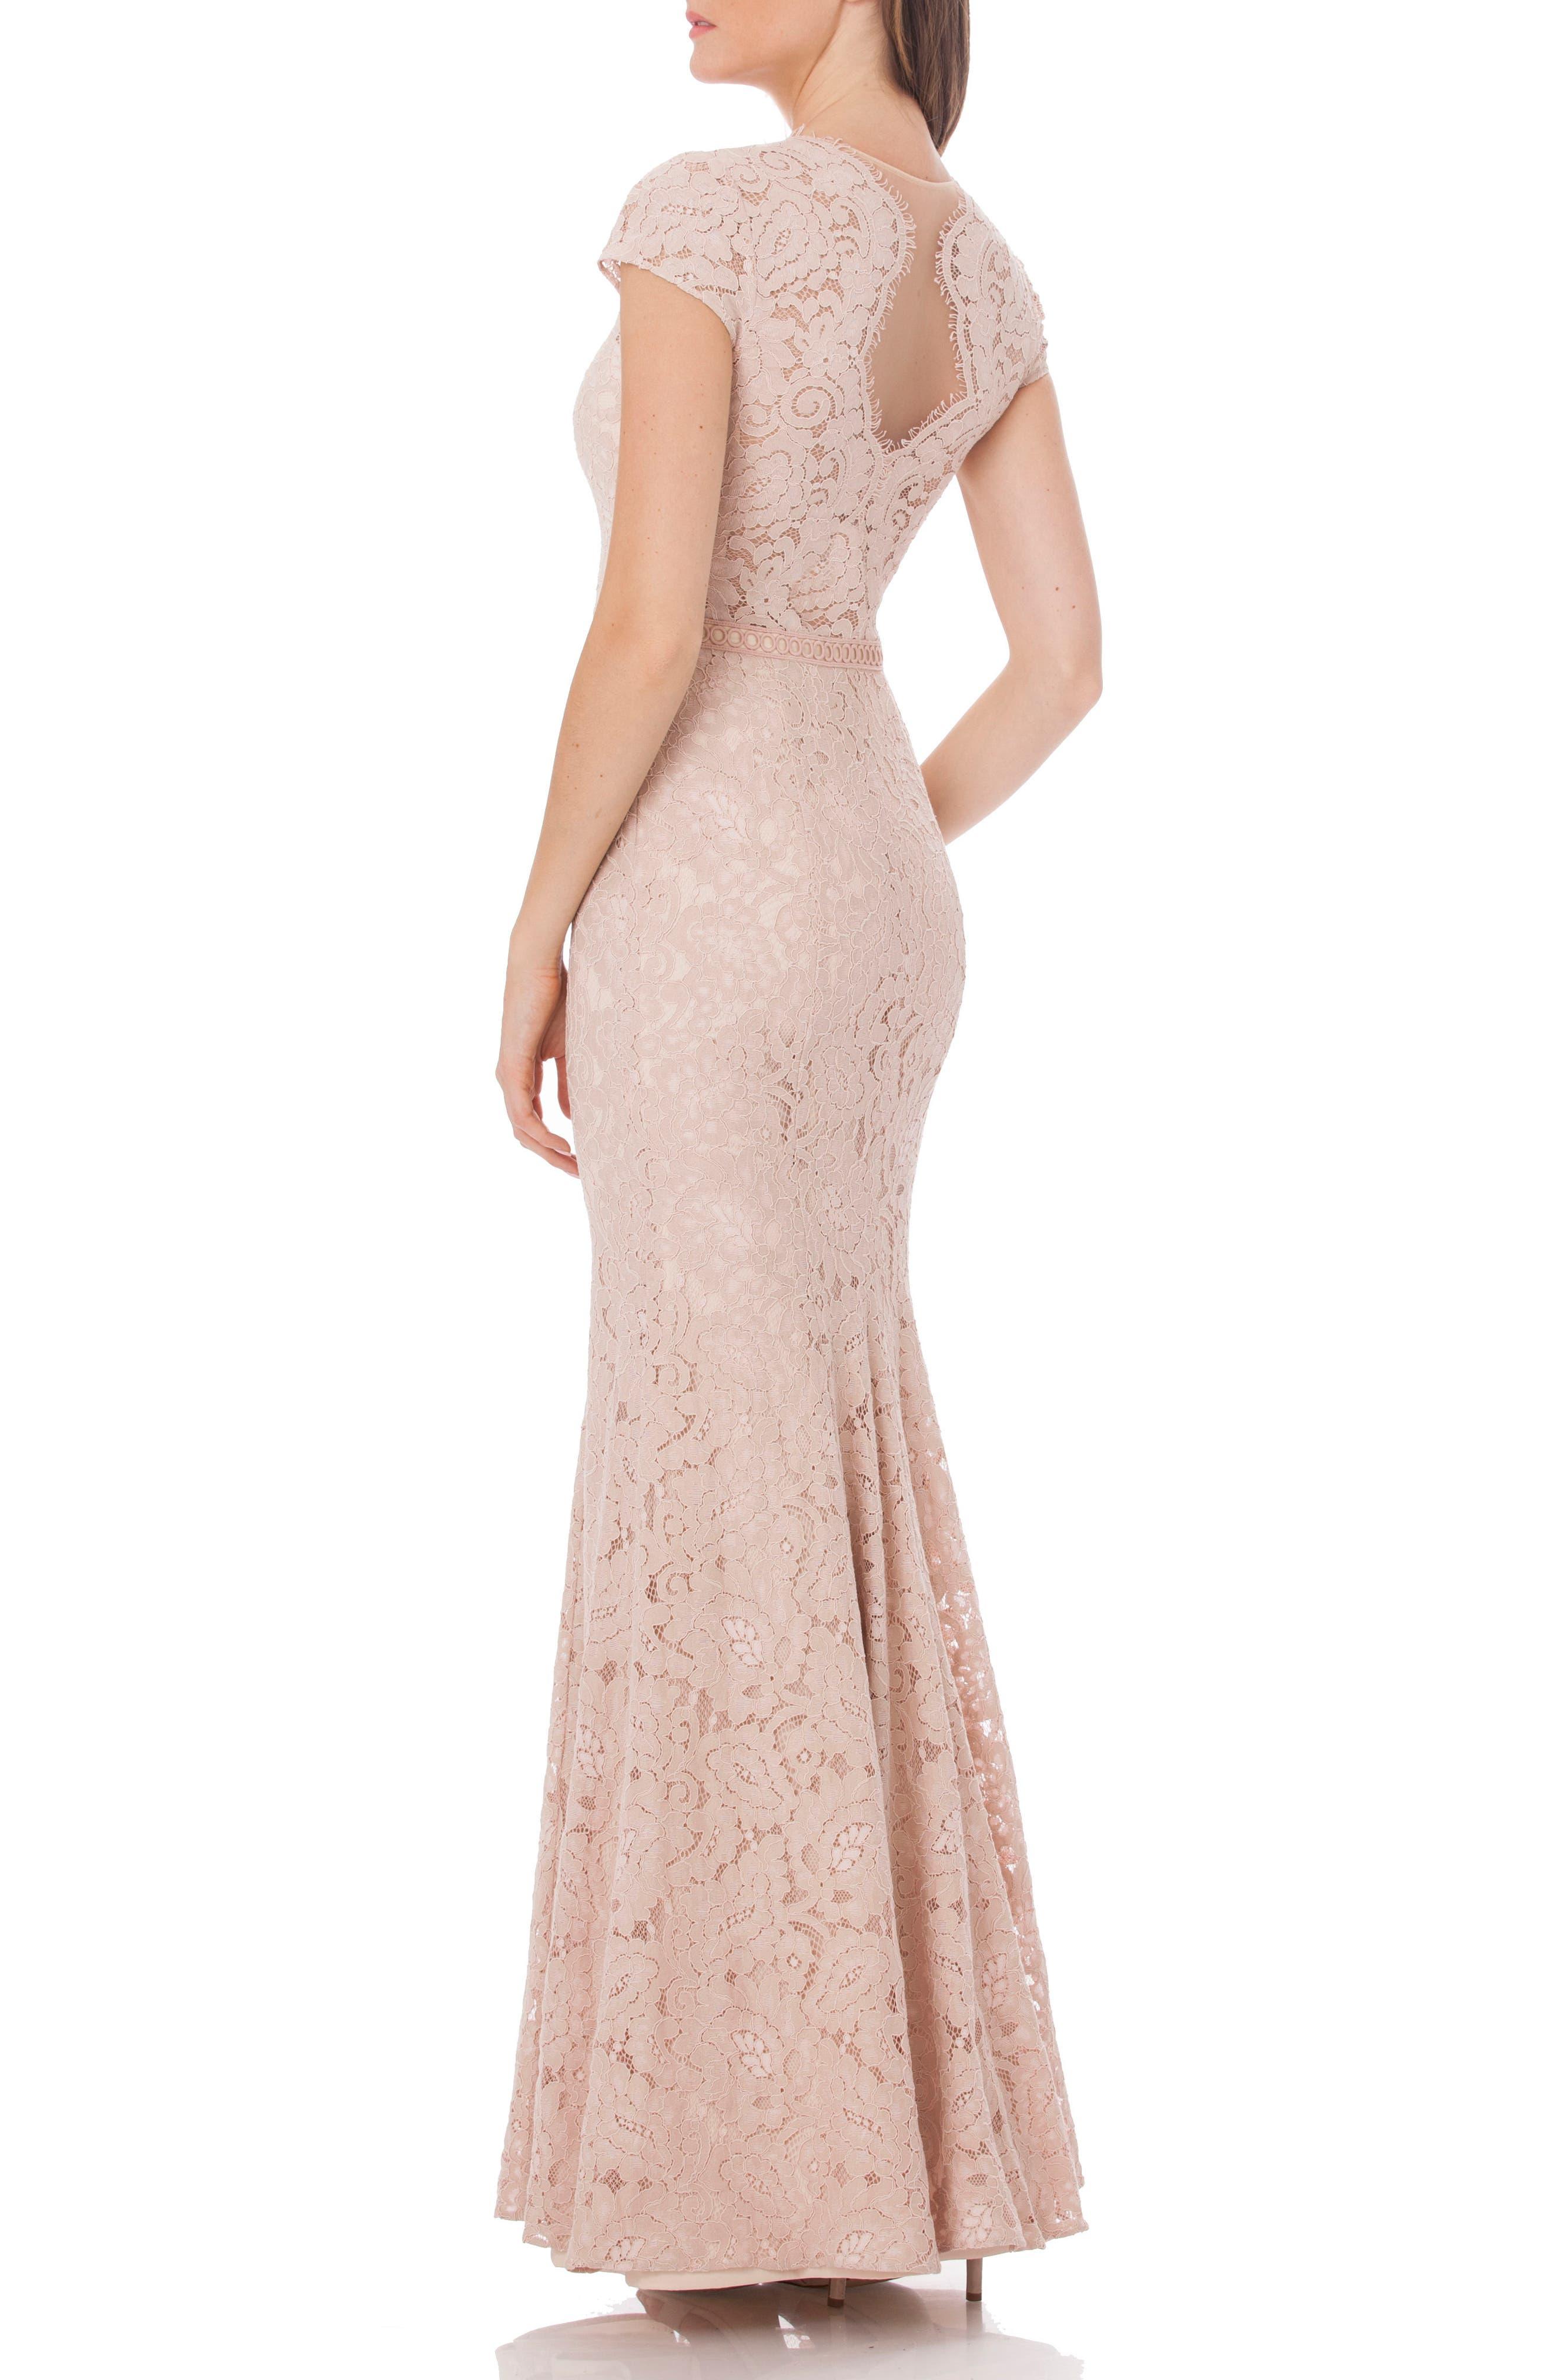 Lace Mermaid Gown,                             Alternate thumbnail 2, color,                             Blush